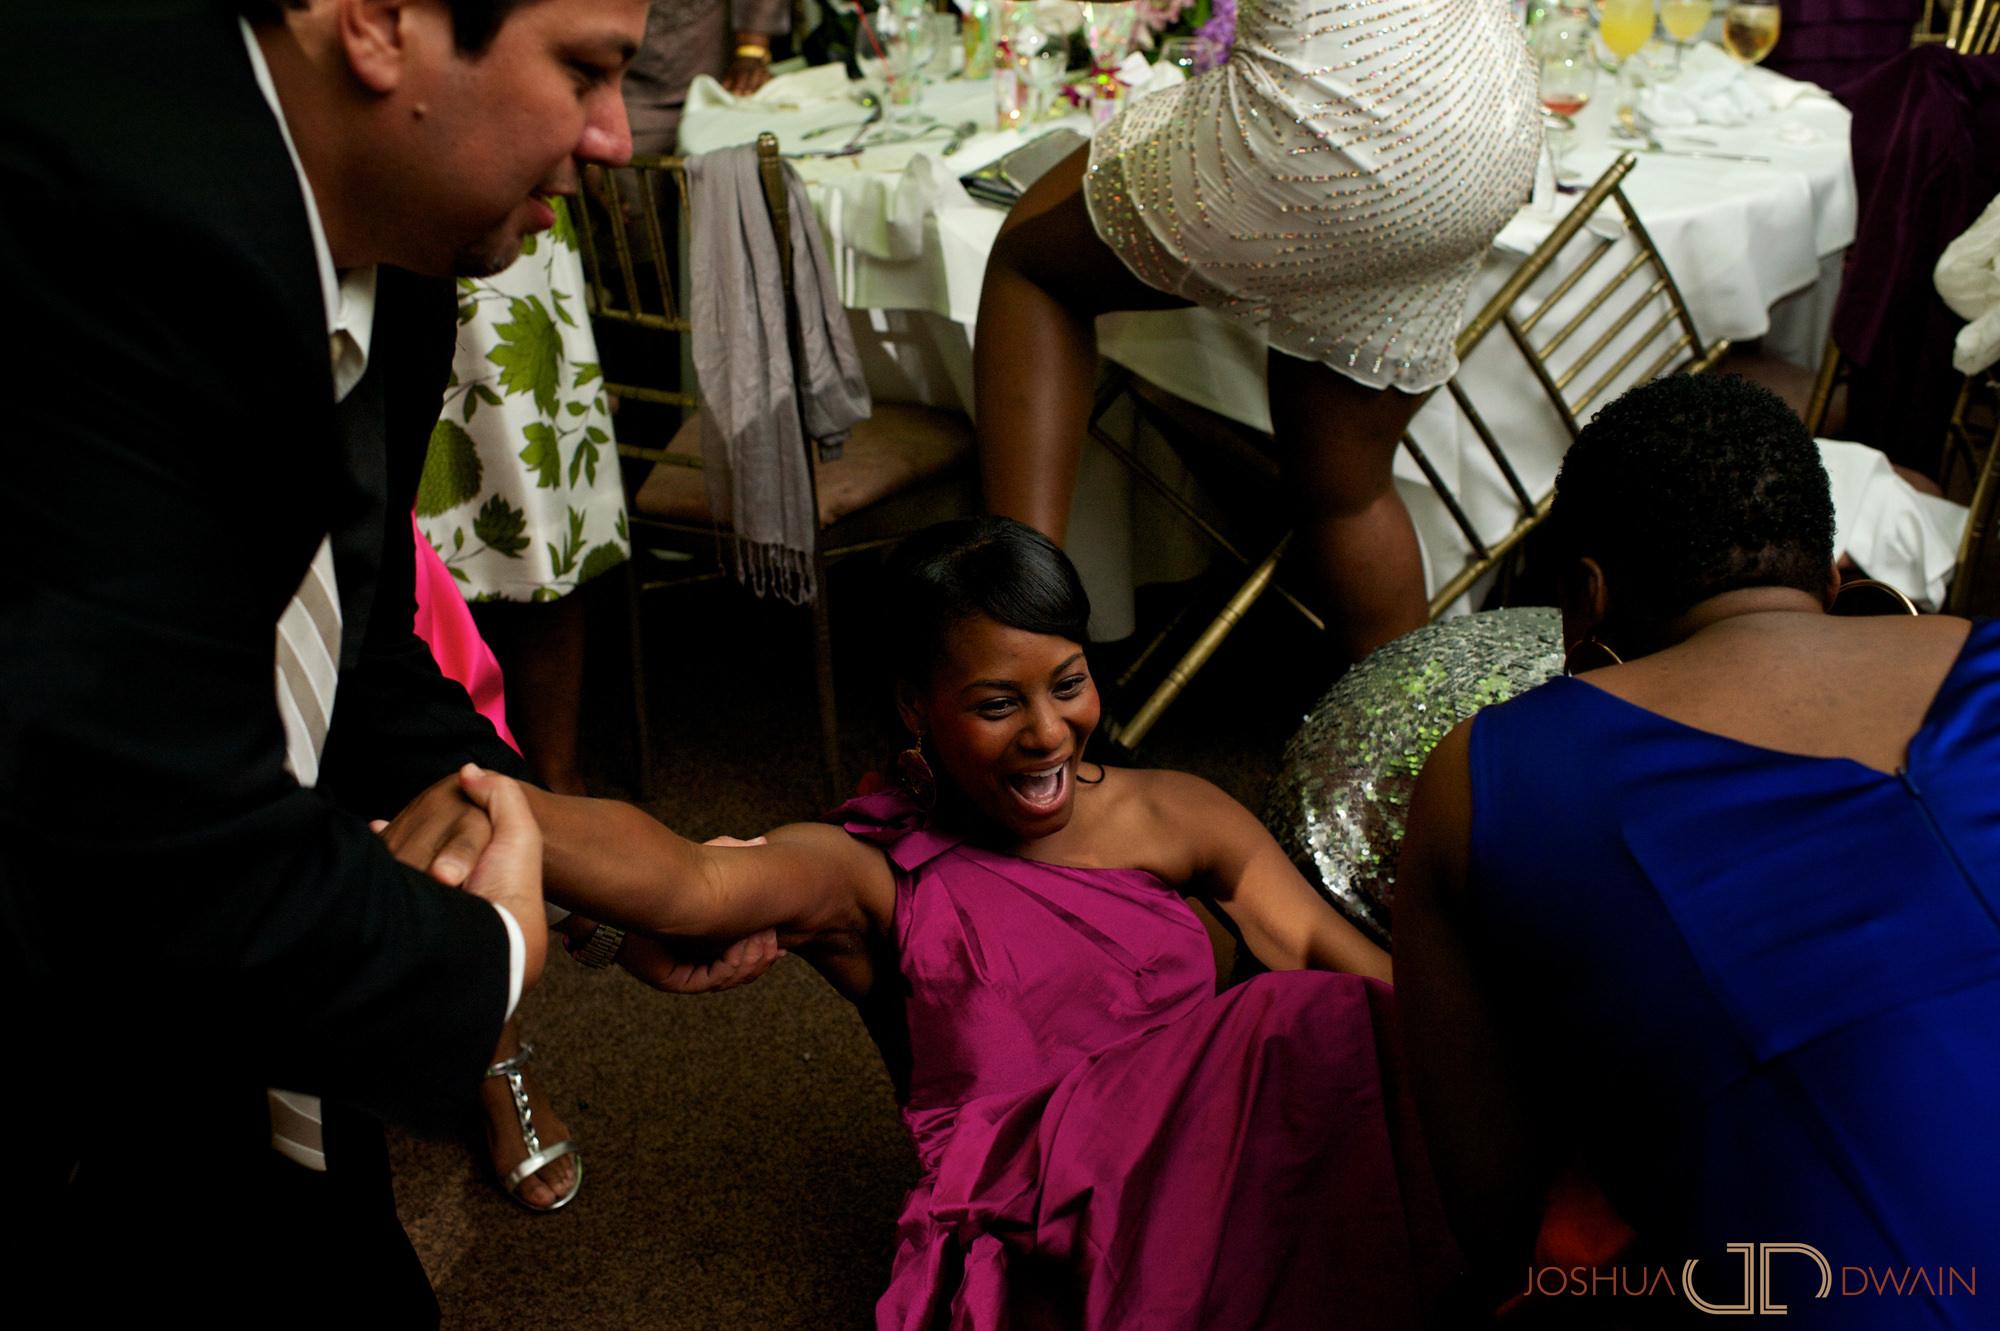 jessica-frank-022-giando-on-the-water-brooklyn-ny-wedding-photographer-joshua-dwain-2011-09-02_jf_594